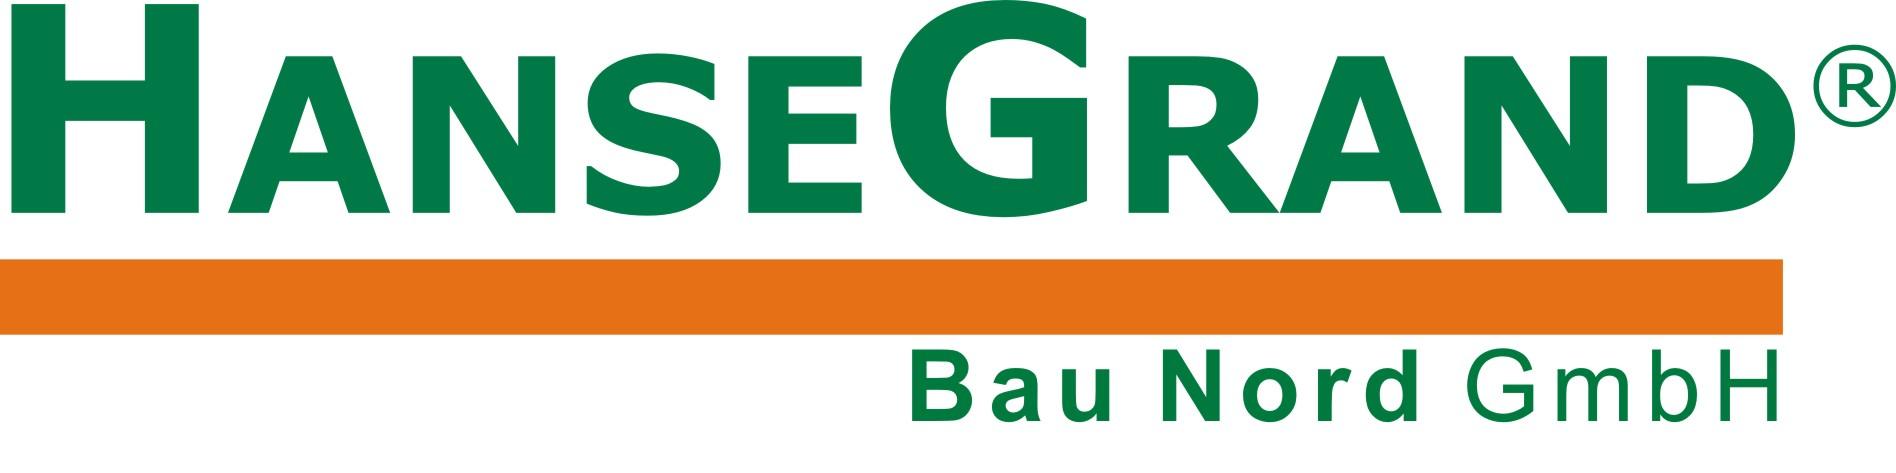 HanseGrand Bau Nord